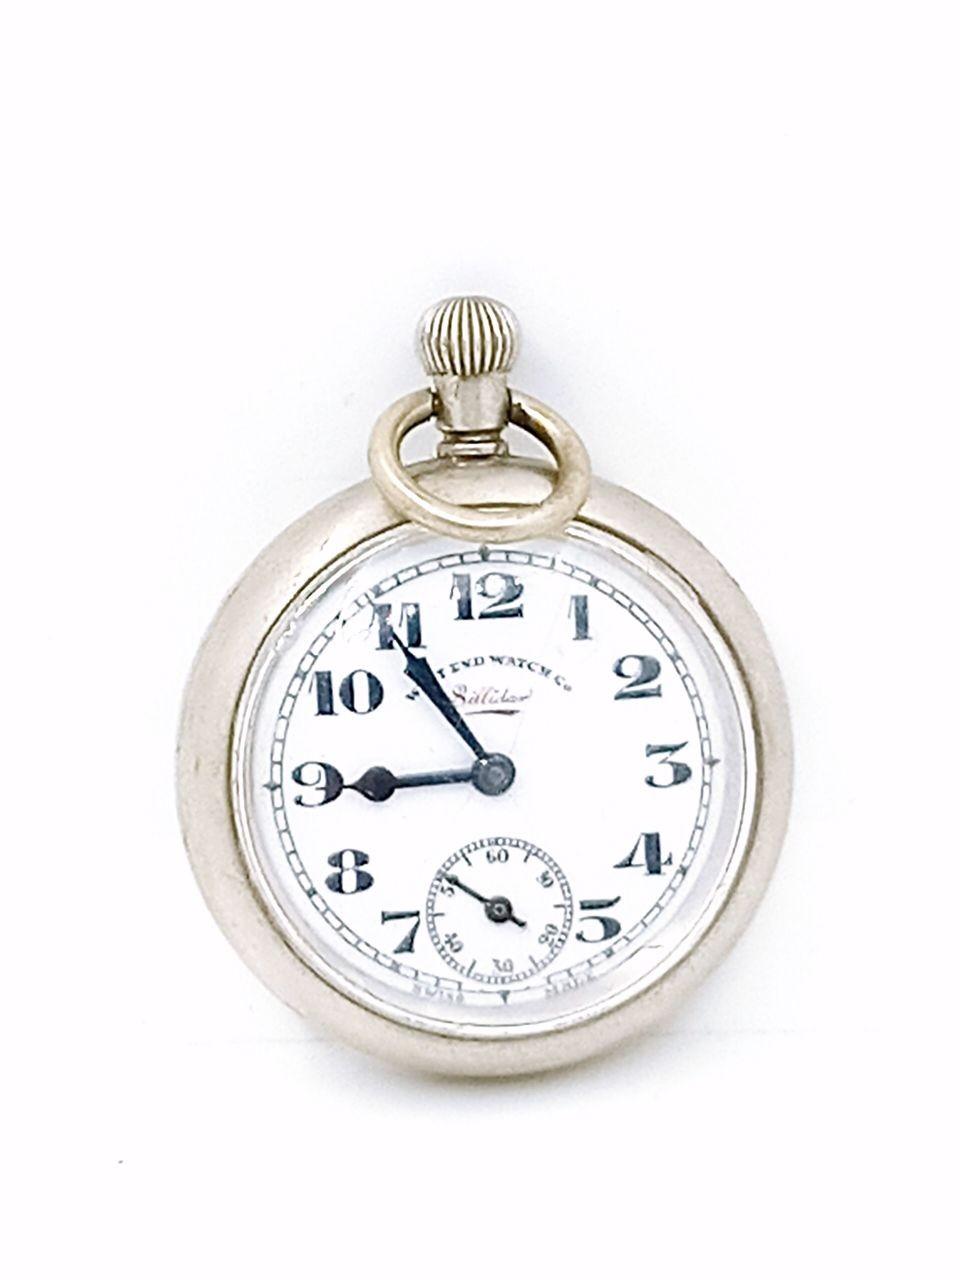 west end sillidar pocket watch